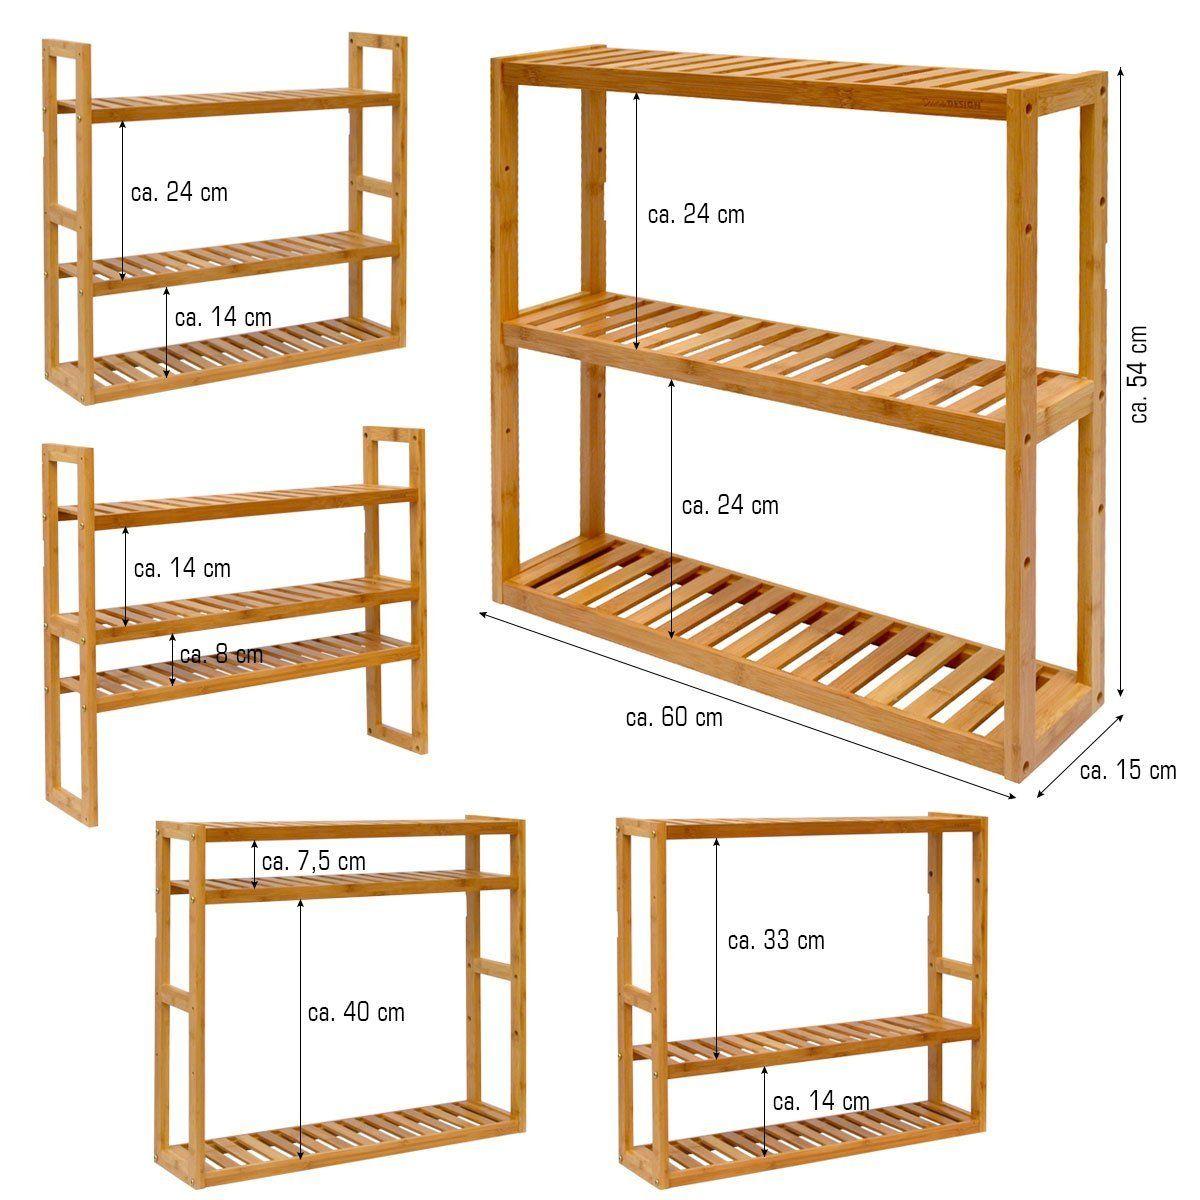 Wandregal Badezimmer Holz